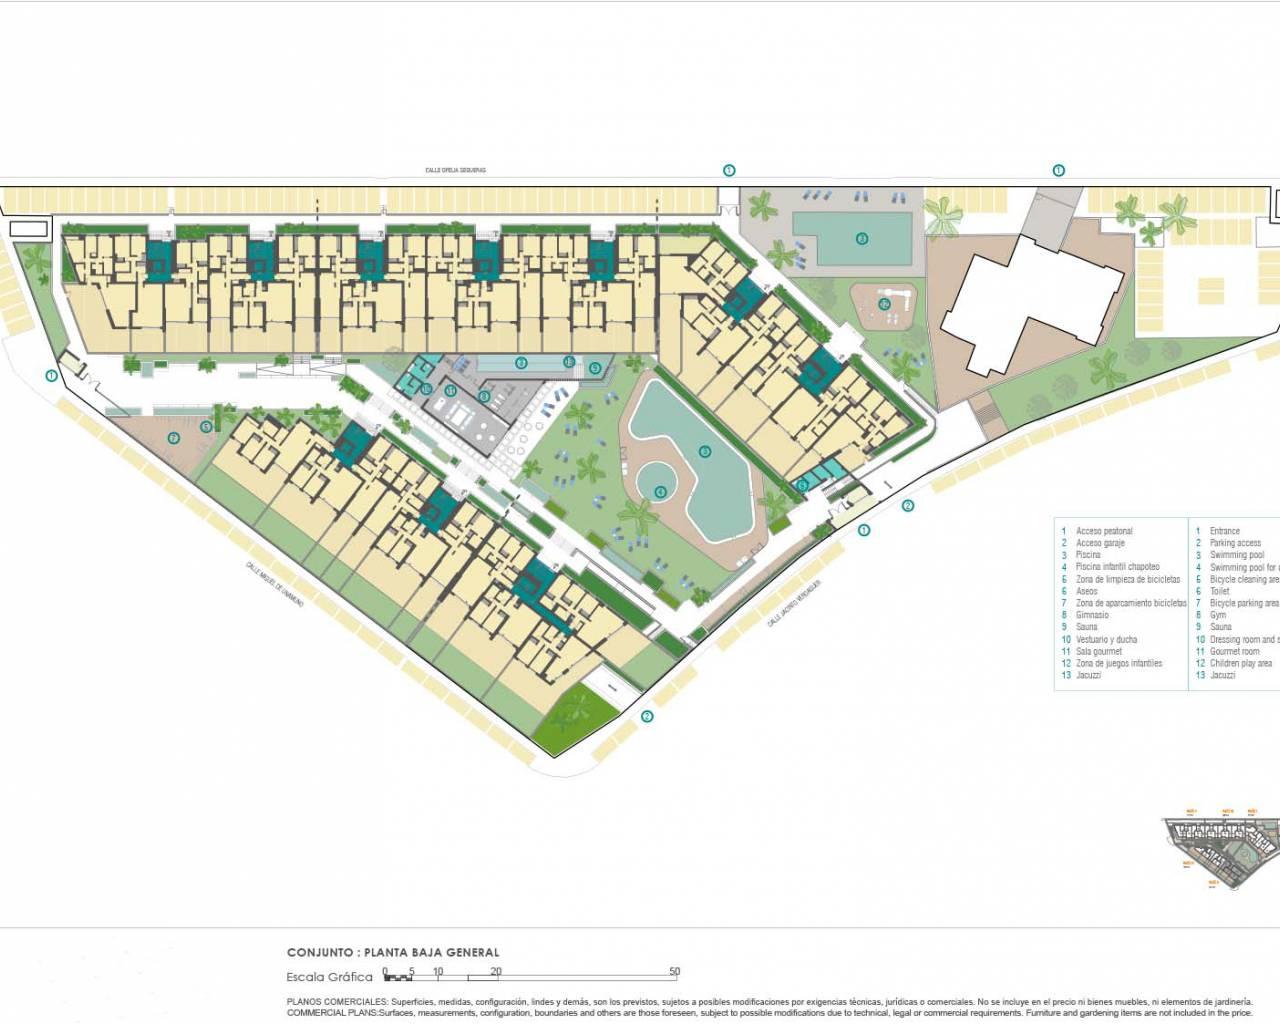 nieuwbouw-appartement-orihuela-costa-campoamor_5593_xl